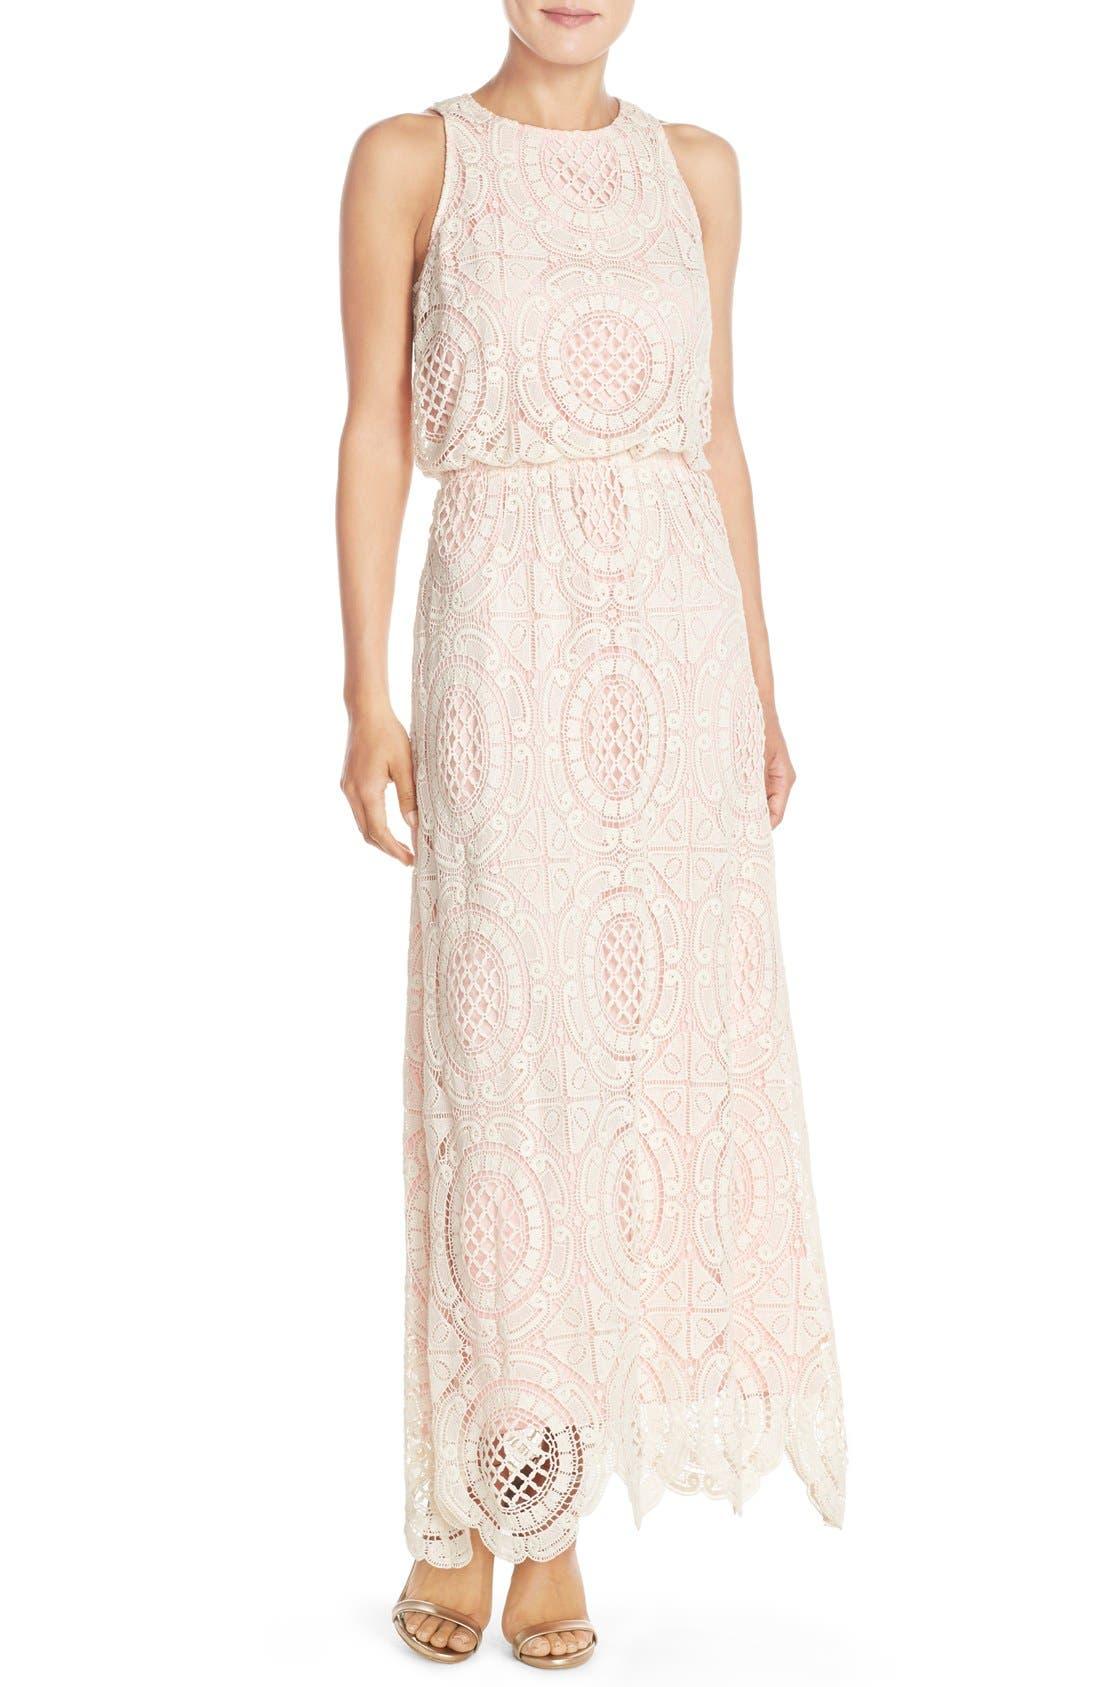 Lace Blouson Maxi Dress,                             Main thumbnail 1, color,                             251